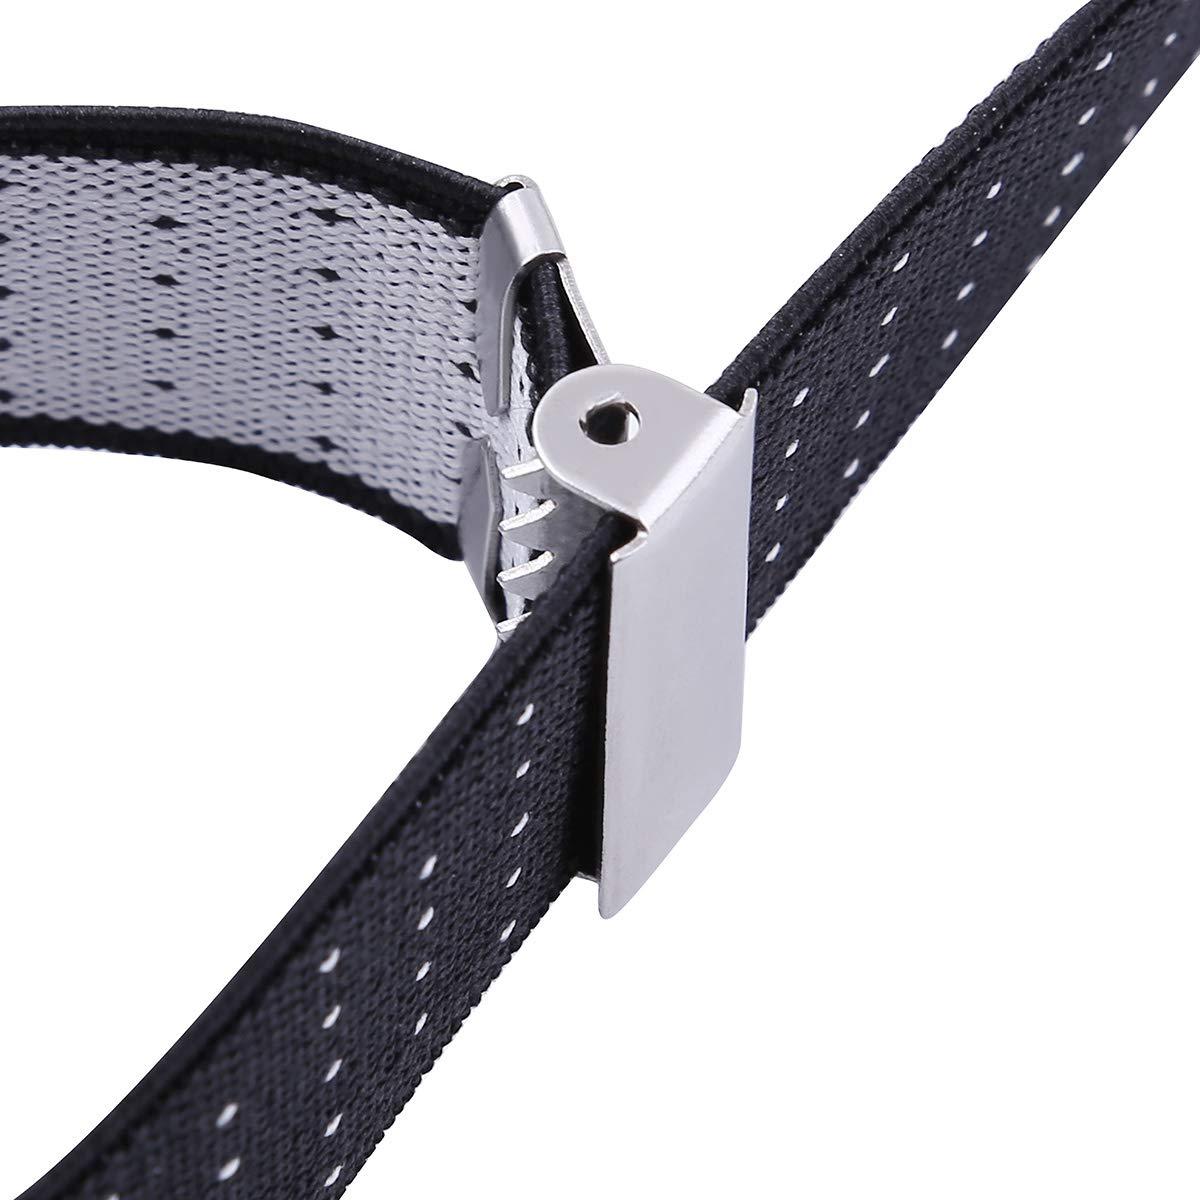 IEFIEL 1 Pair Mens Y-Shape Shirt Stays Holders Elastic Sock Garters Suspenders with Non-slip Locking Clamps Adjustable Length